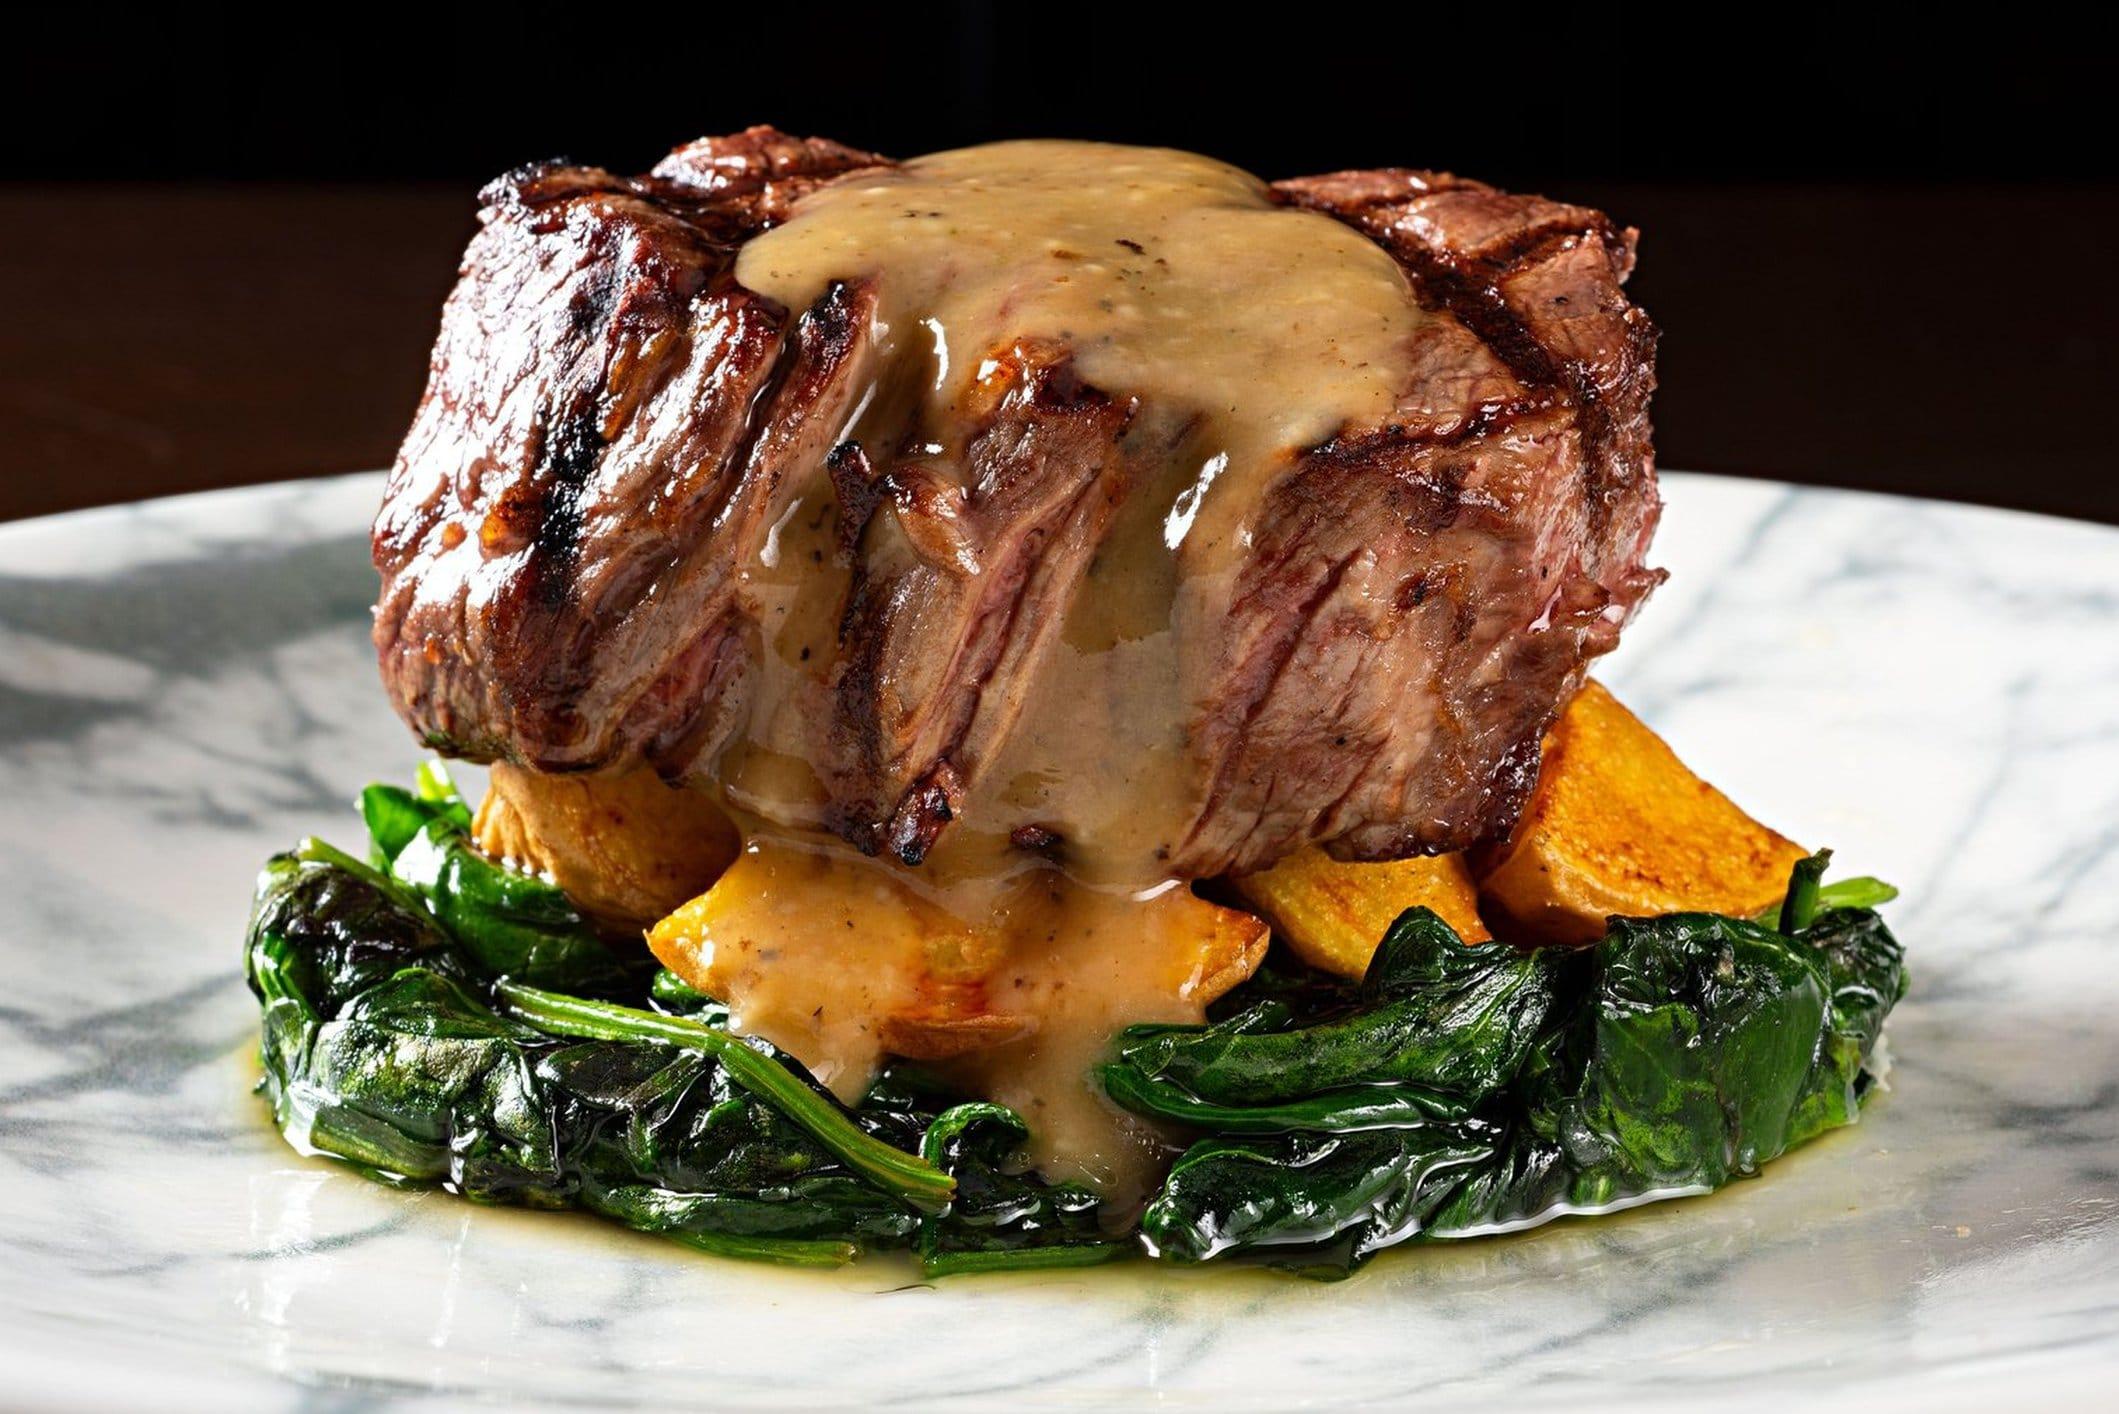 A fillet steak on a plate